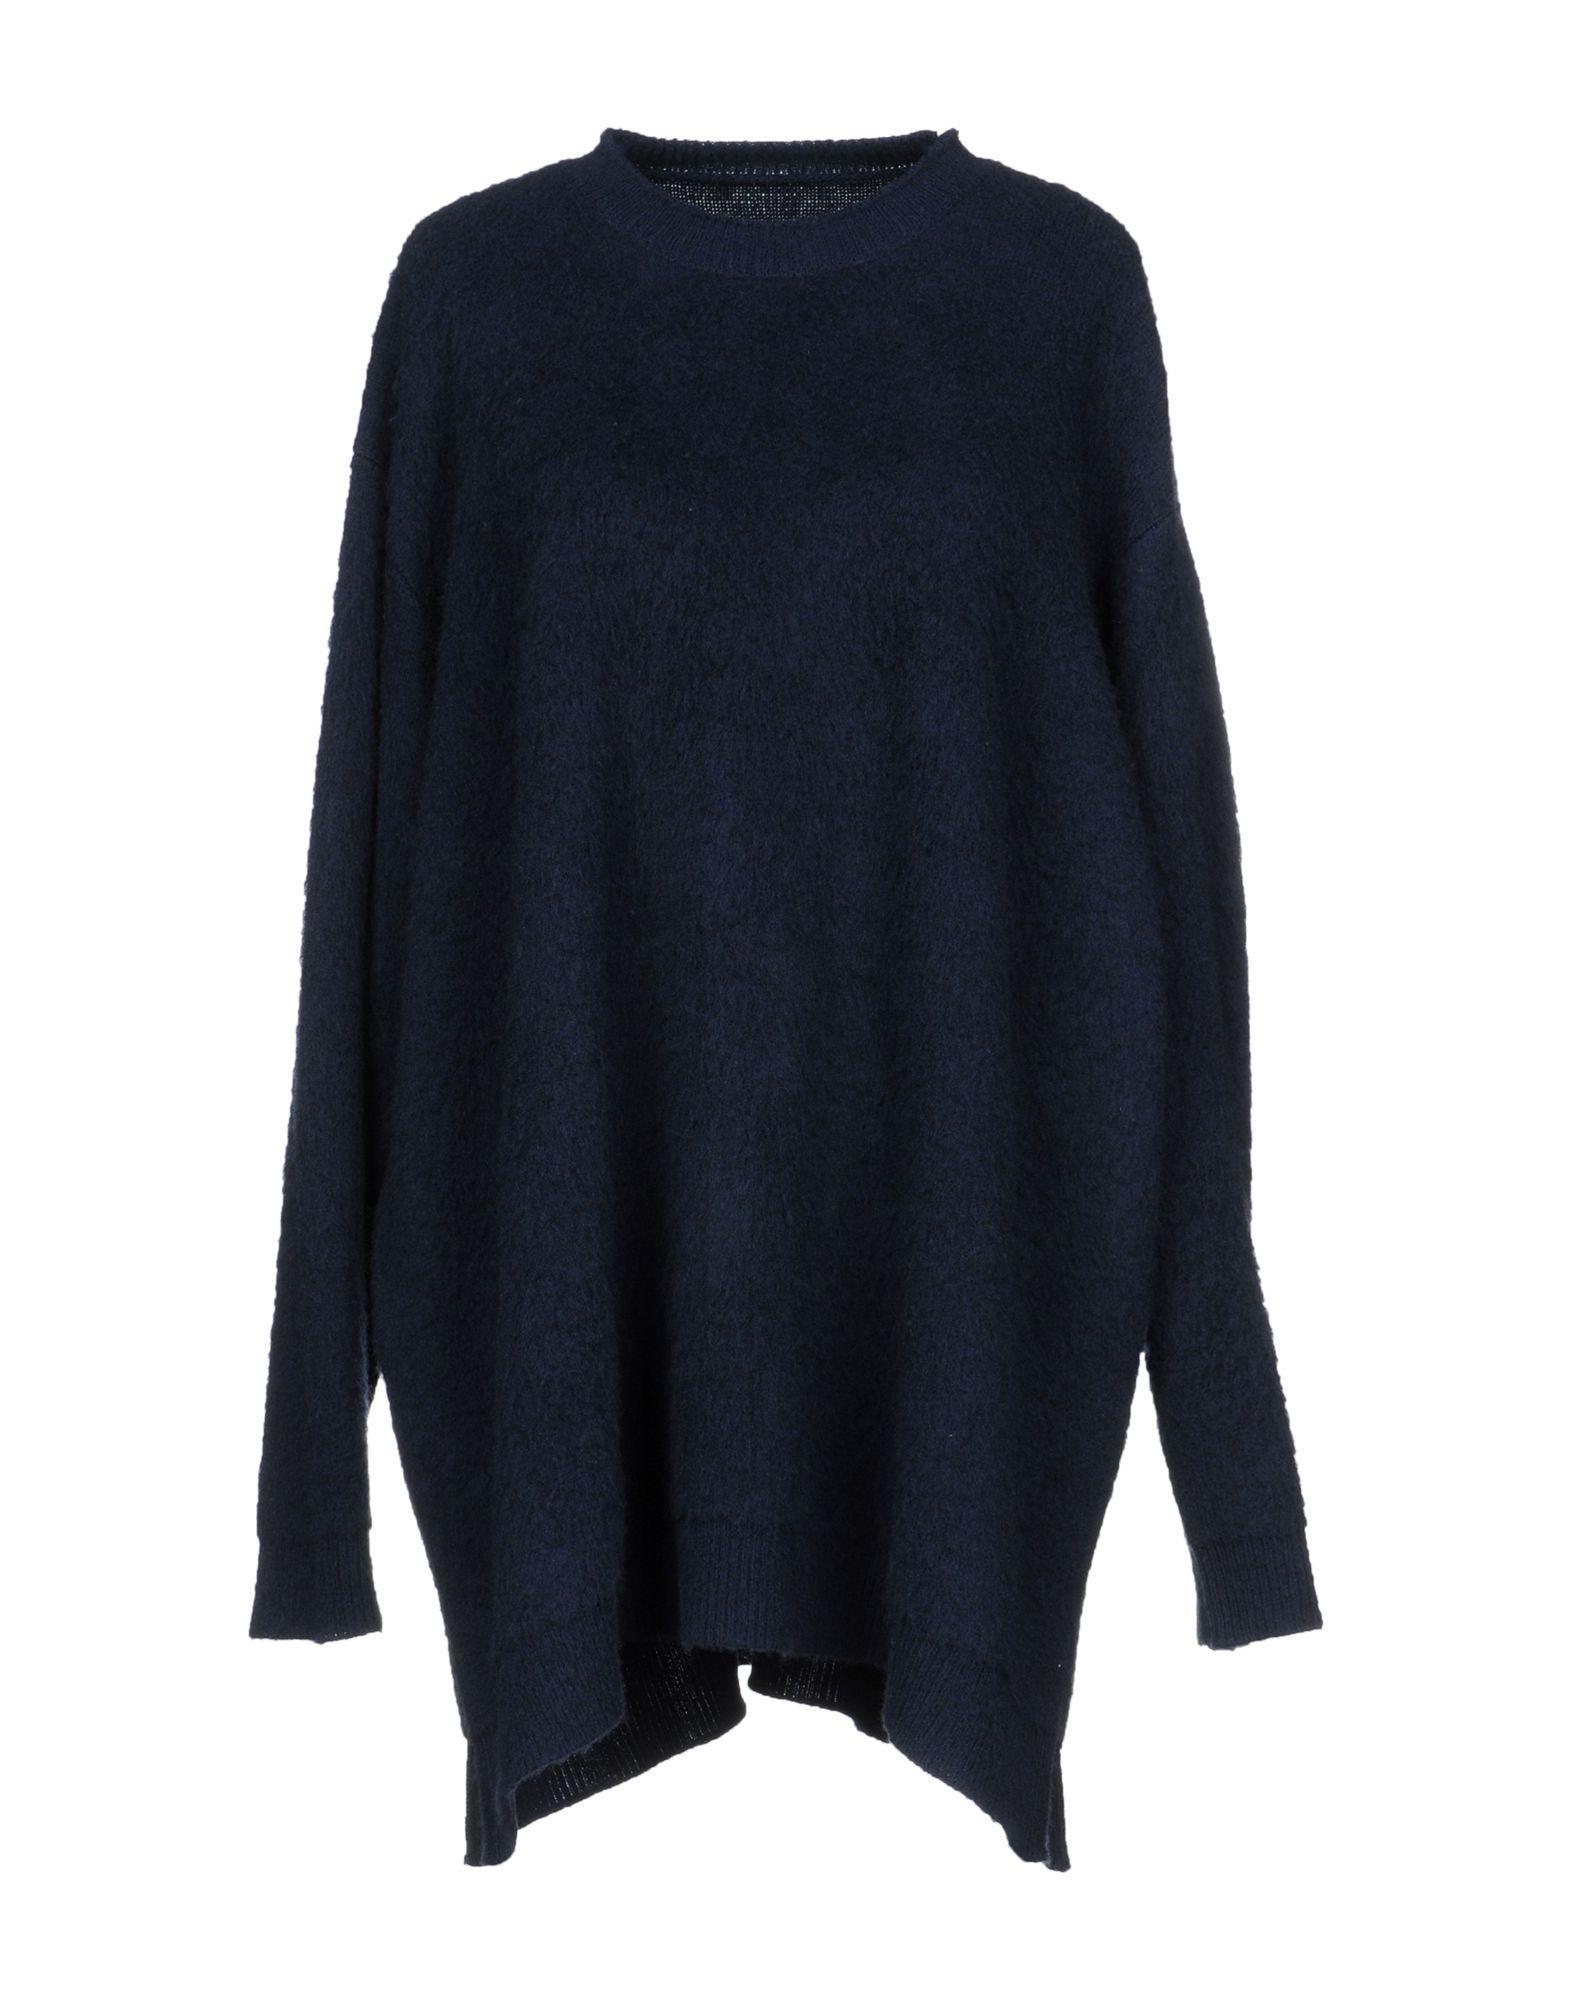 Mm6 Maison Margiela Short Dress In Dark Blue